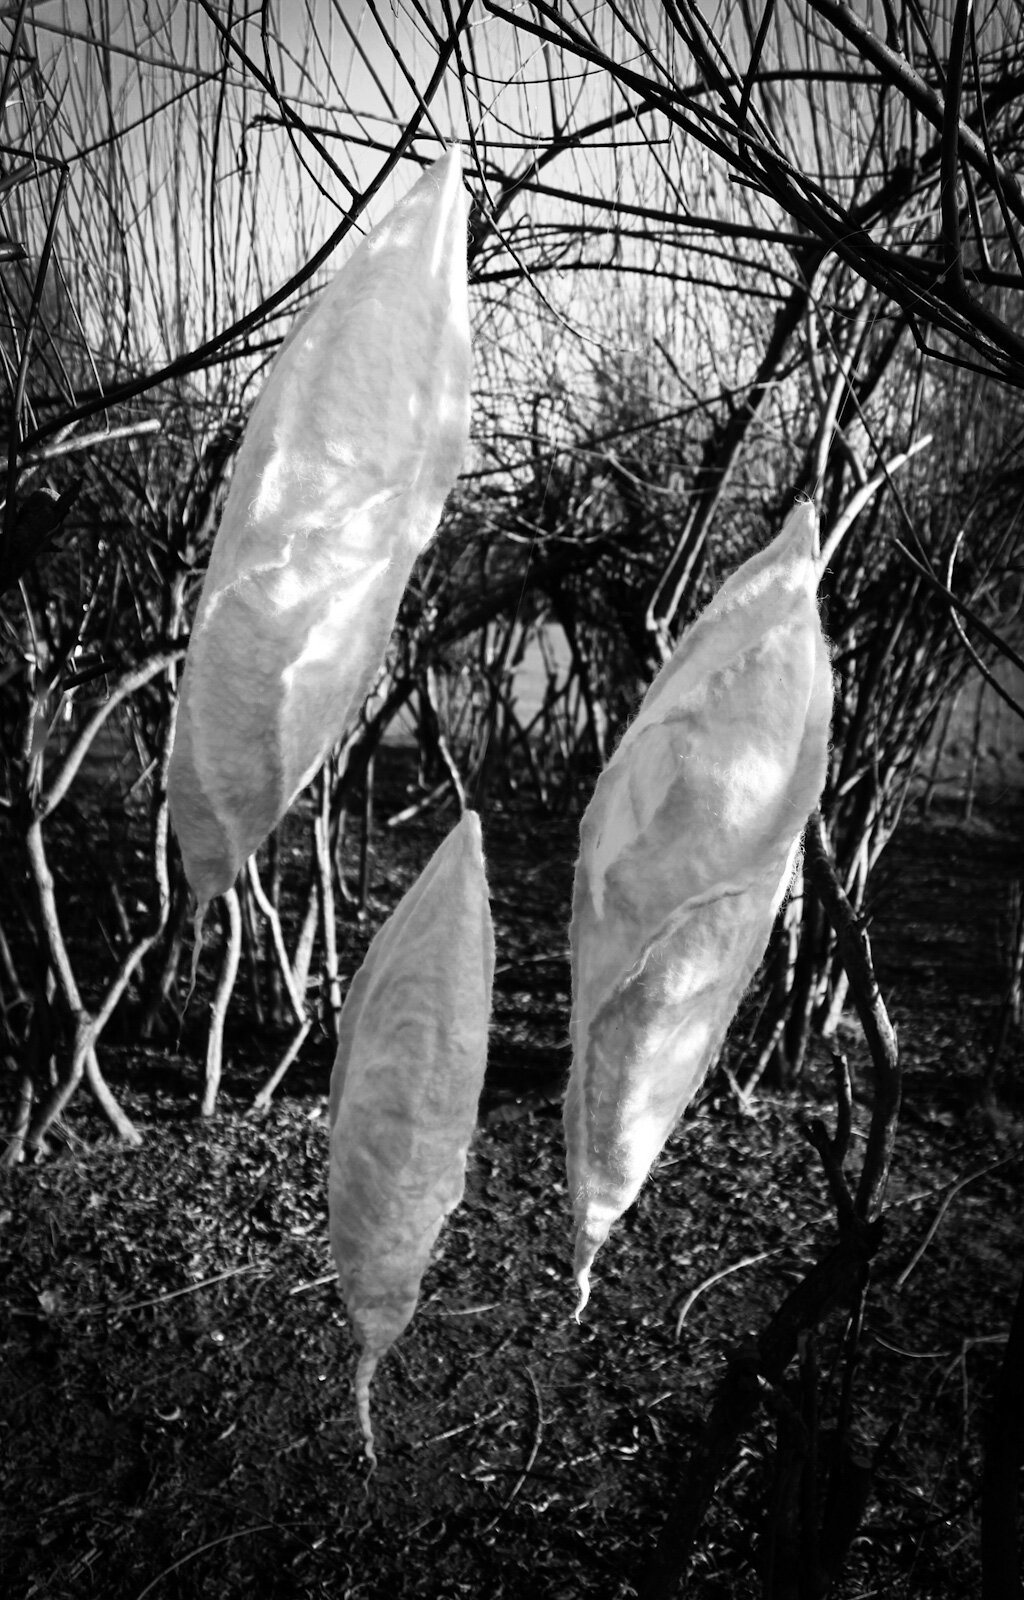 Chrysalis breeze monoWB.jpg